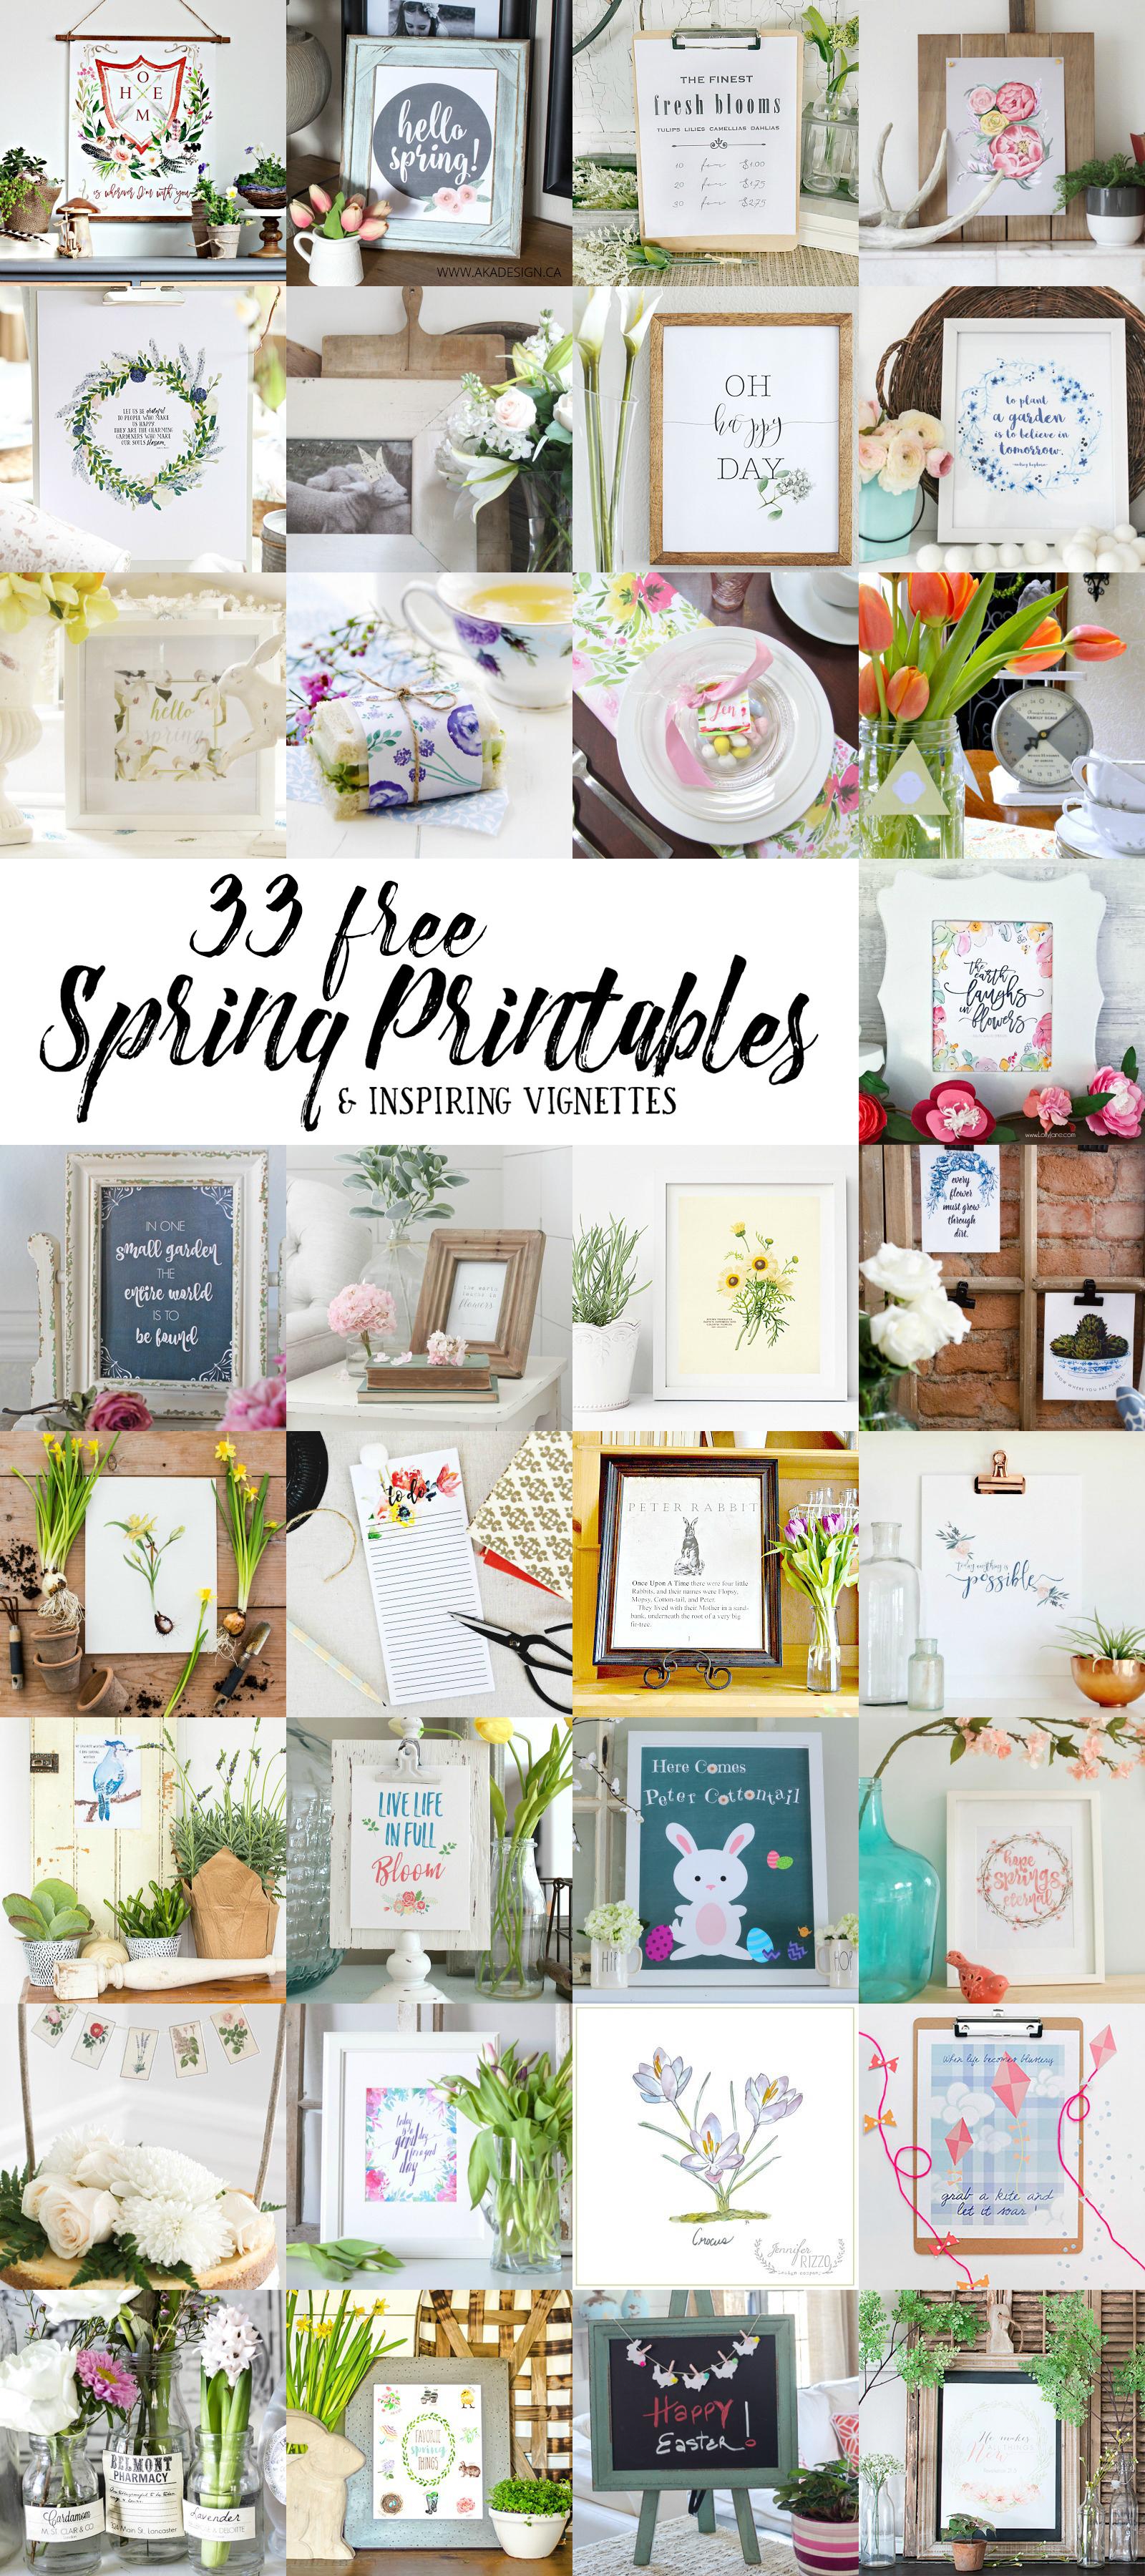 33 free spring printables poster.